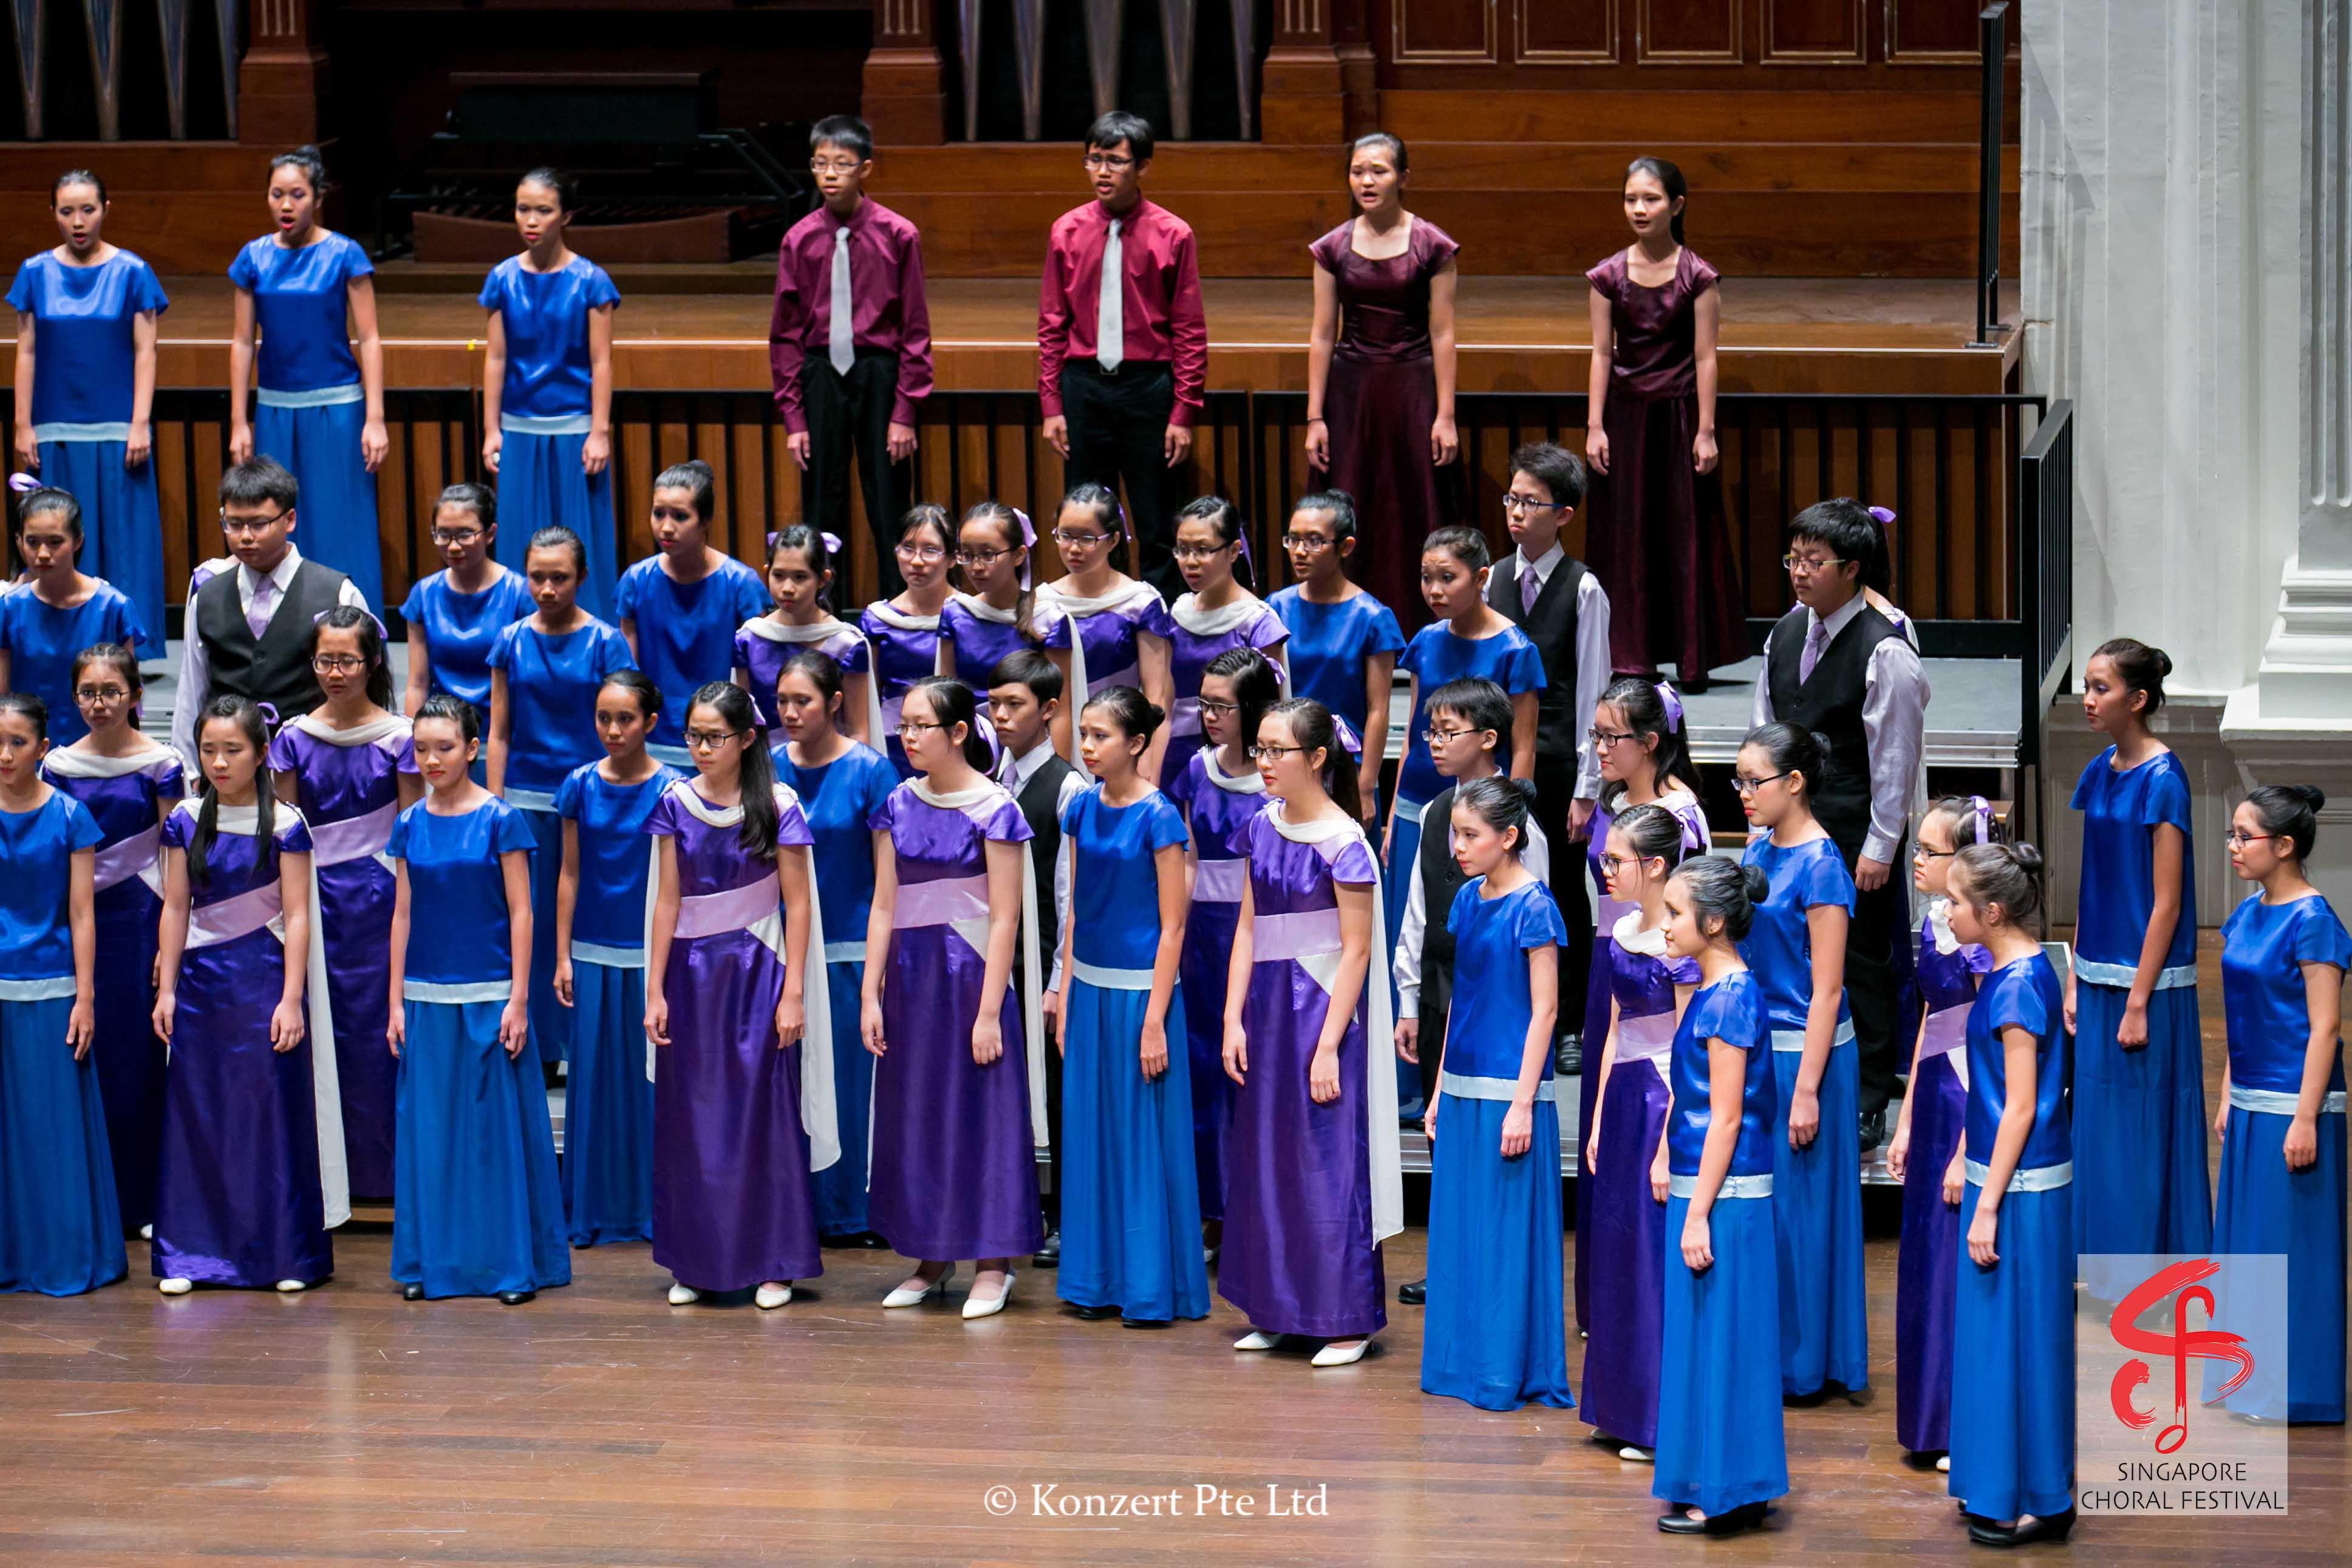 Singapore Choral Festival 7-8-15 (279).jpg